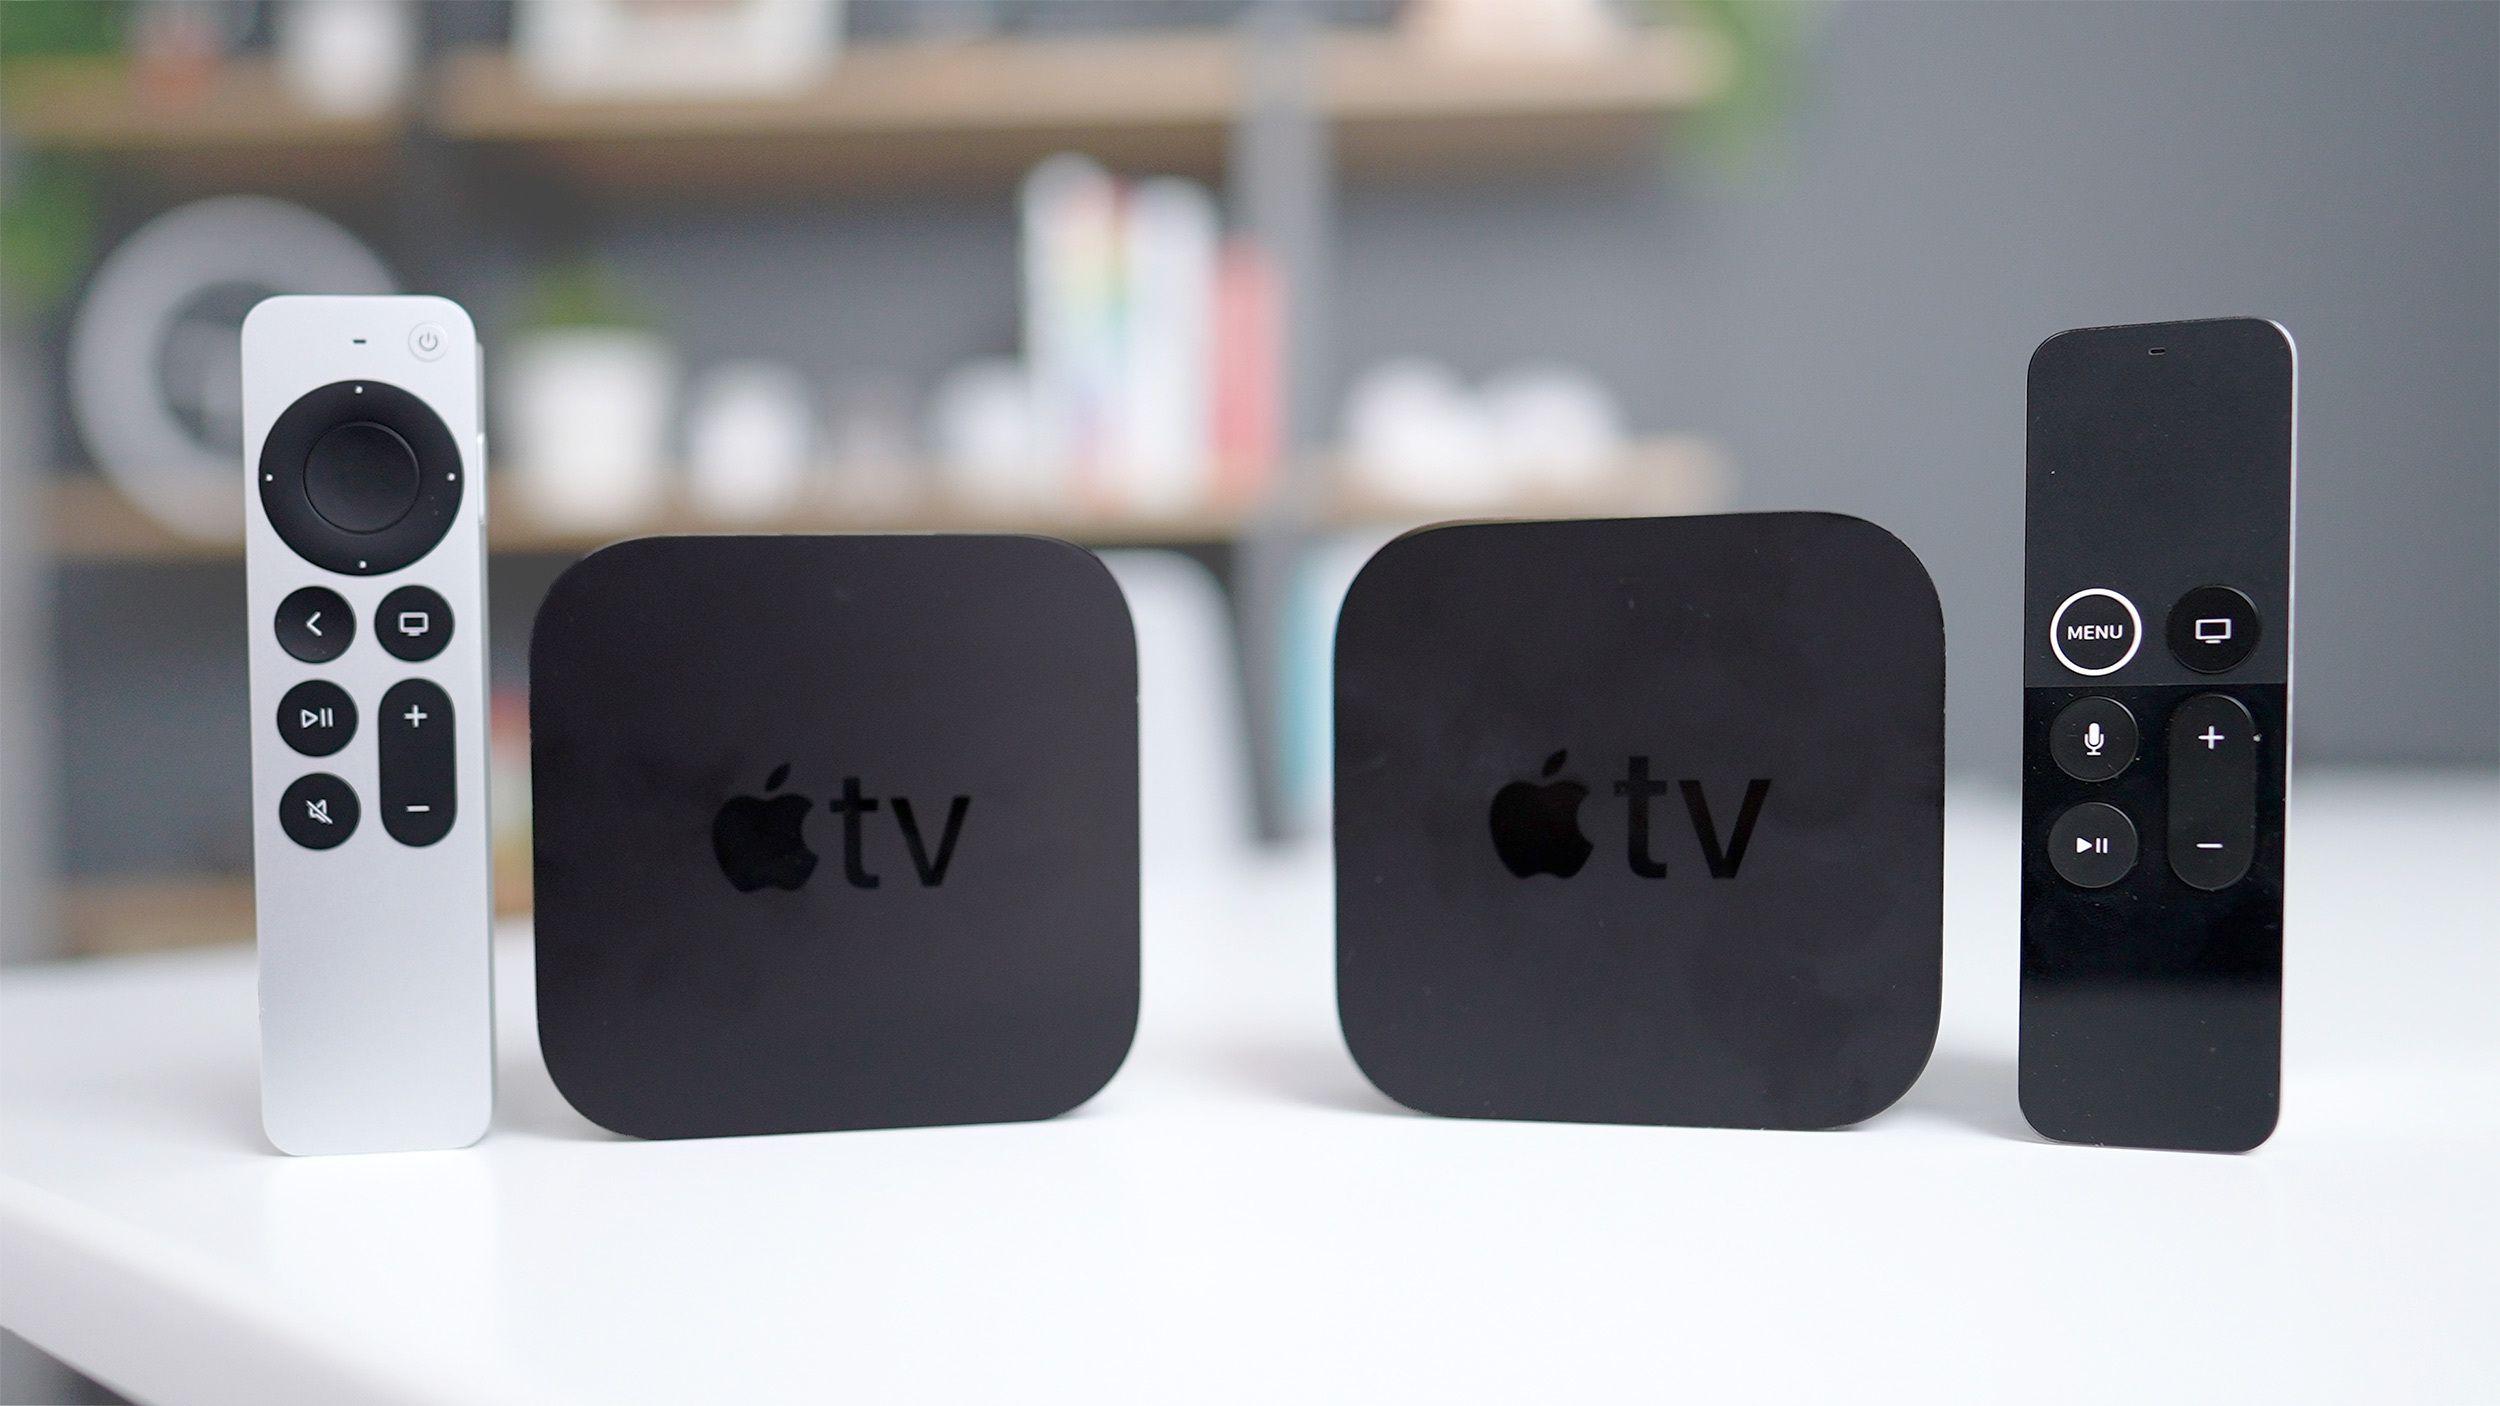 2021 Apple TV 4K vs. 2017 Apple TV 4K: Is It Worth Upgrading?